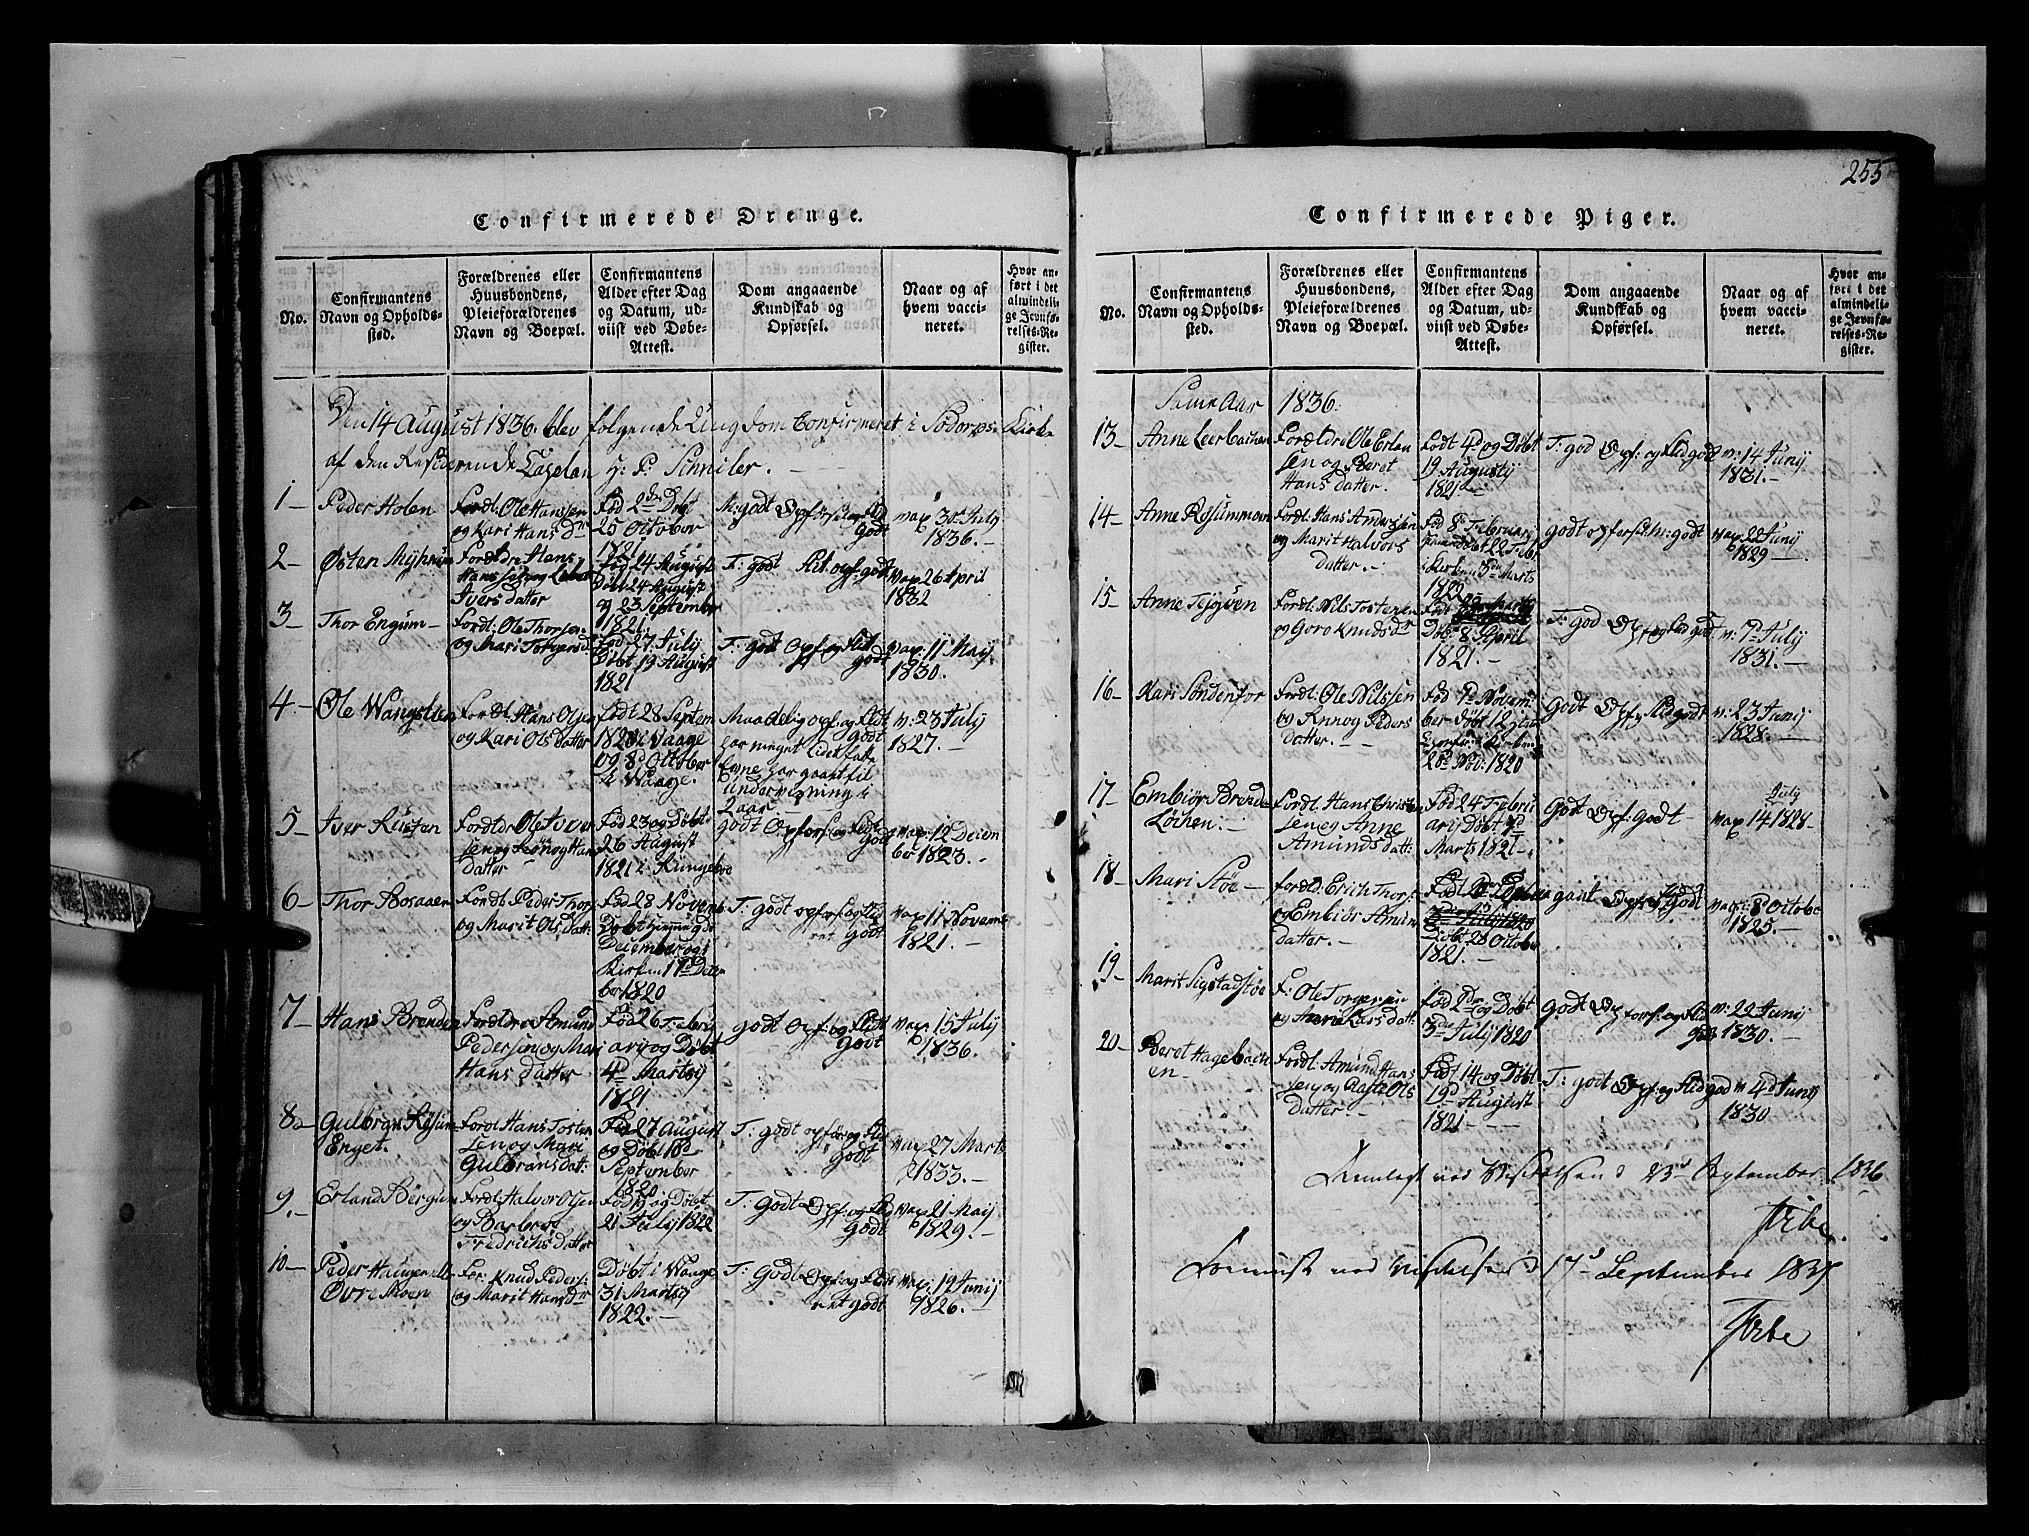 SAH, Fron prestekontor, H/Ha/Hab/L0002: Klokkerbok nr. 2, 1816-1850, s. 255